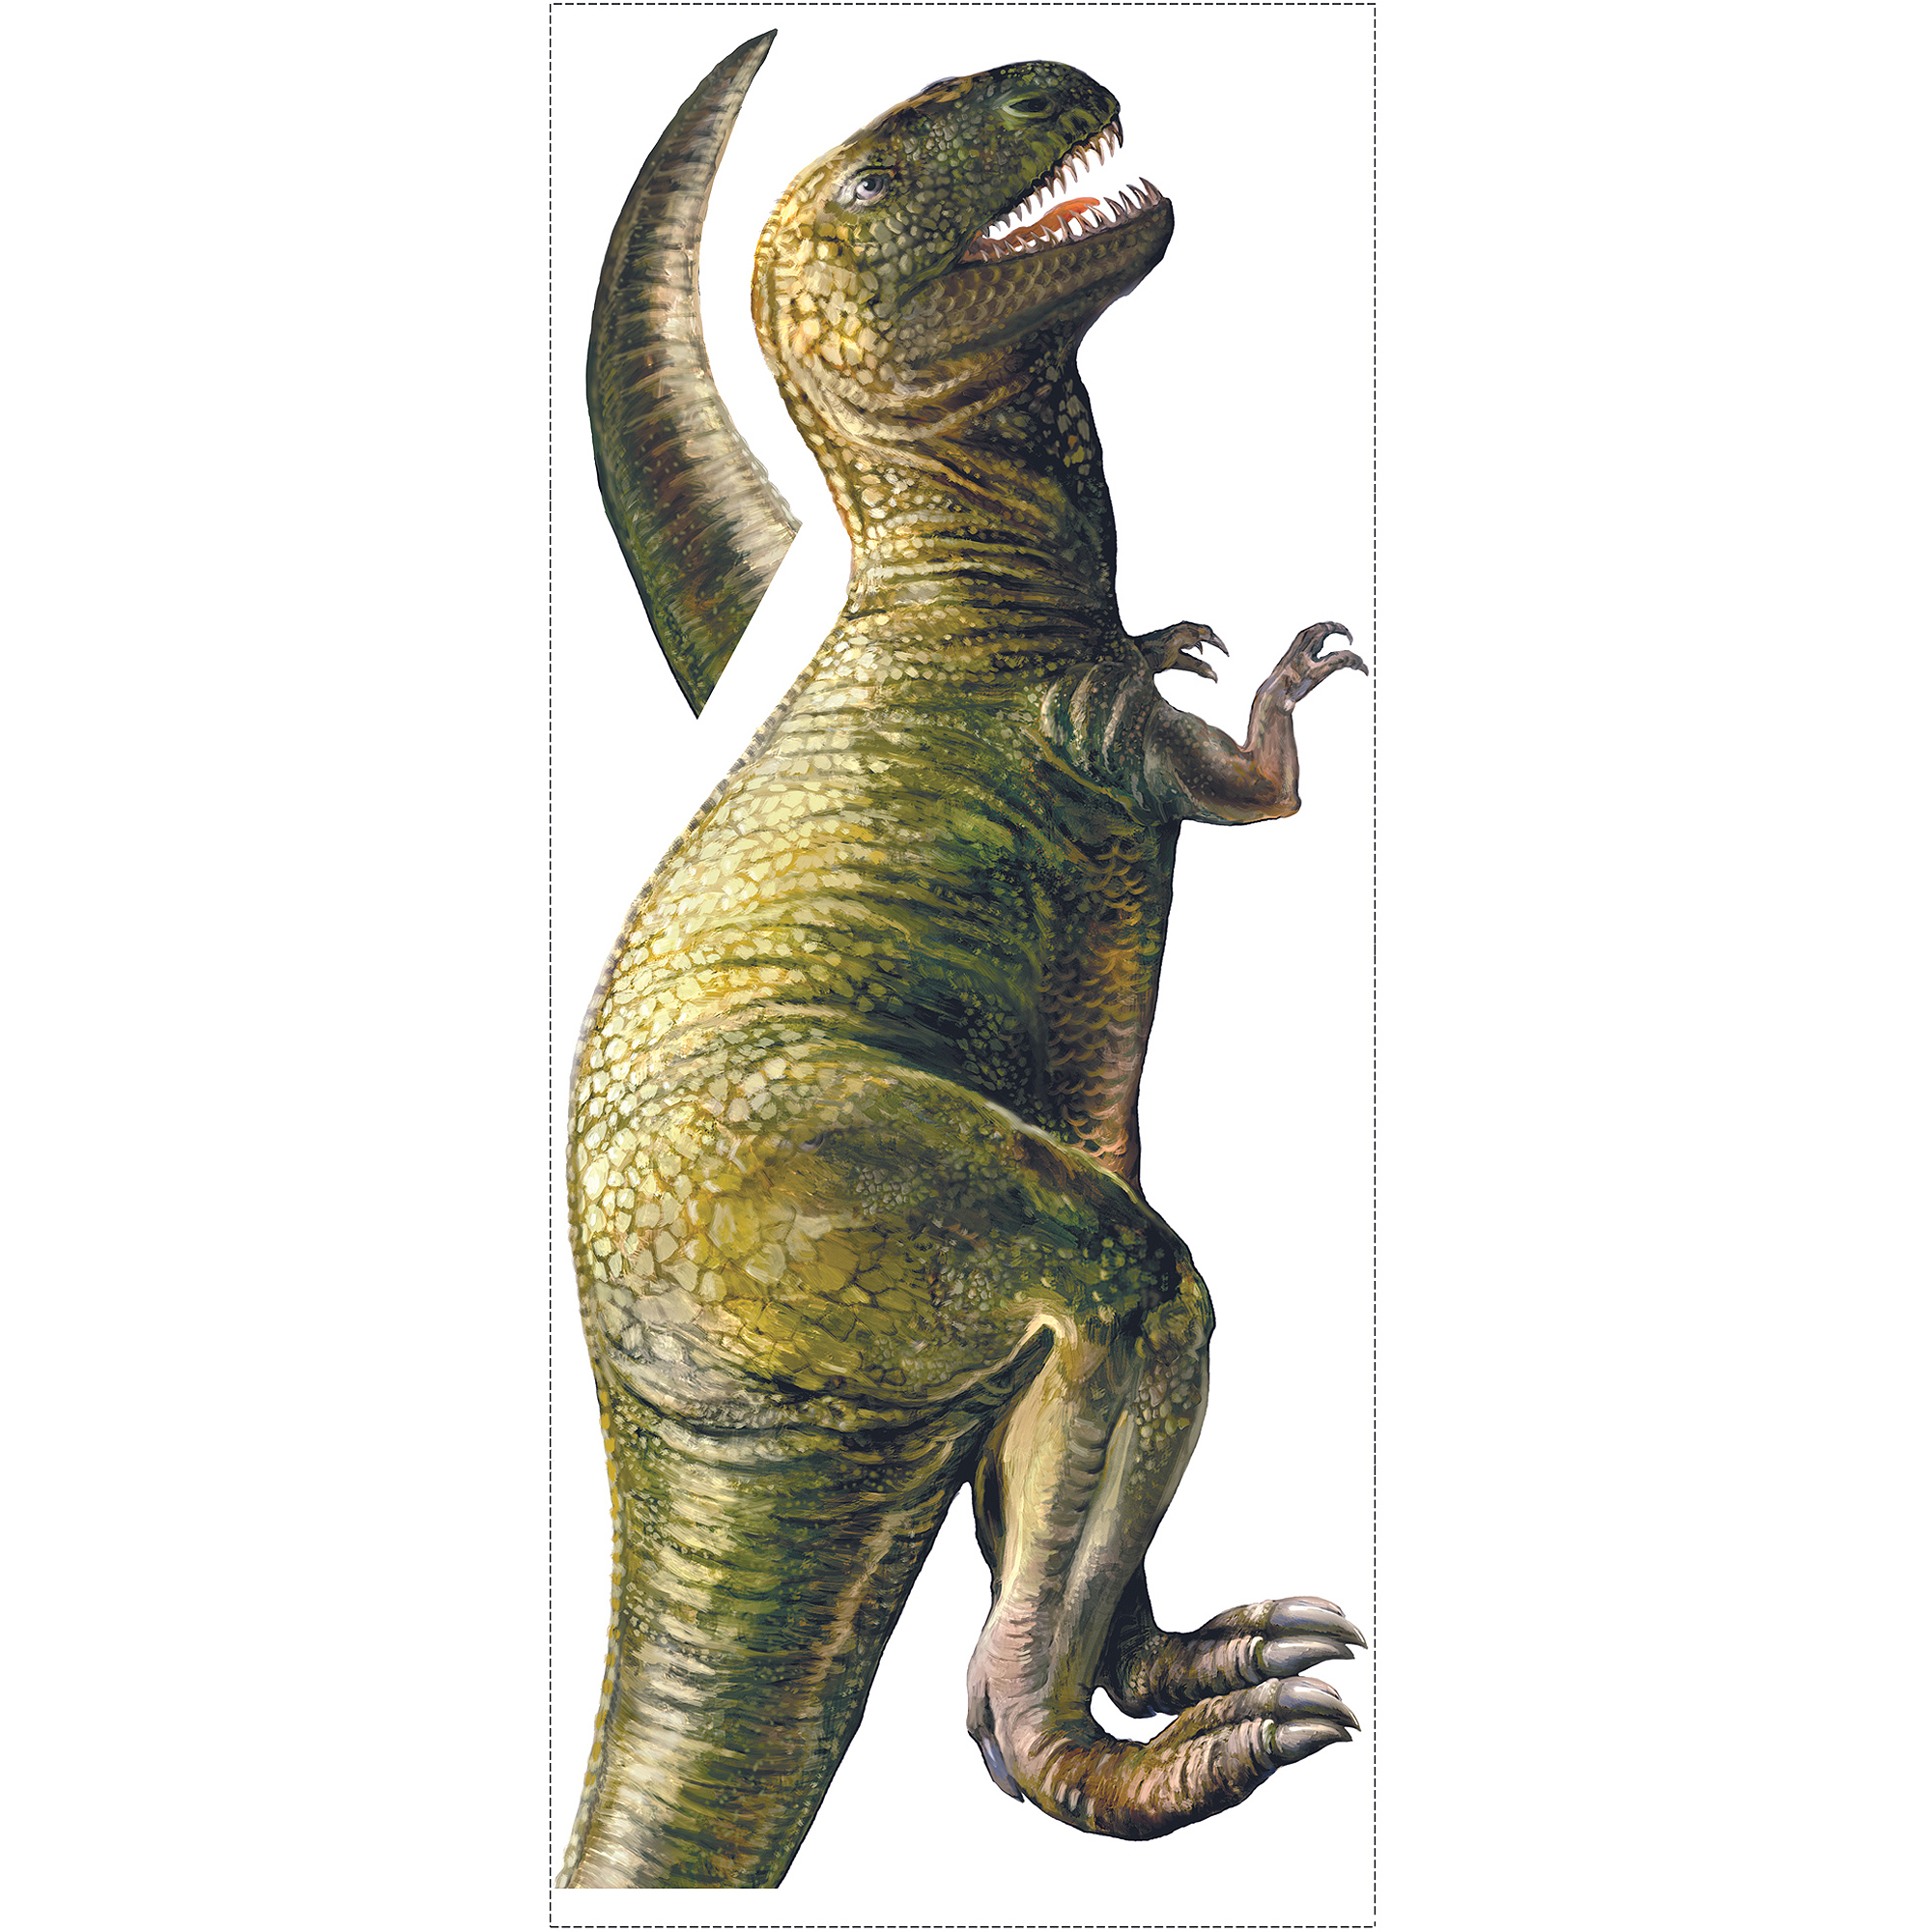 RoomMates Dinosaur Giant Wall Decal